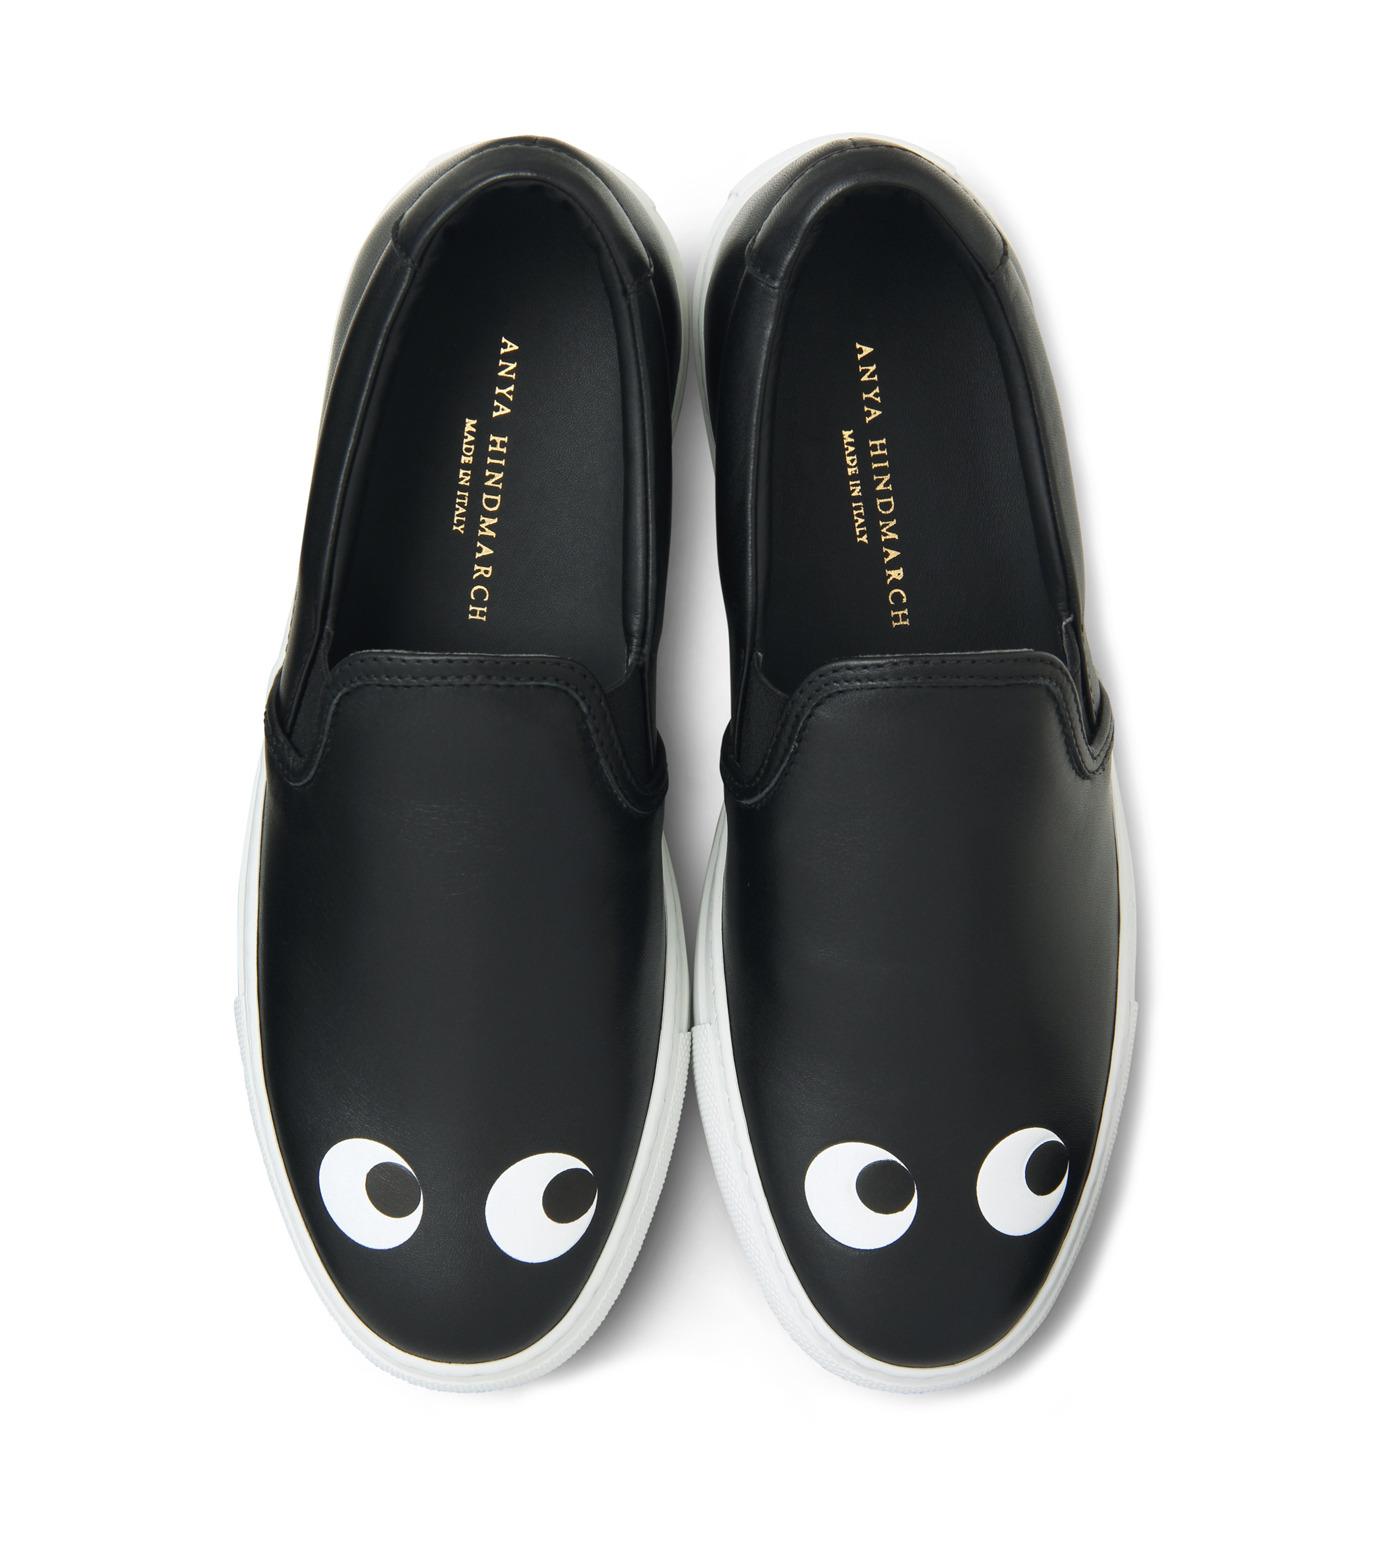 Anya Hindmarch(アニヤハインドマーチ)のSkater Eyes-BLACK(スニーカー/sneaker)-9130-13 拡大詳細画像4